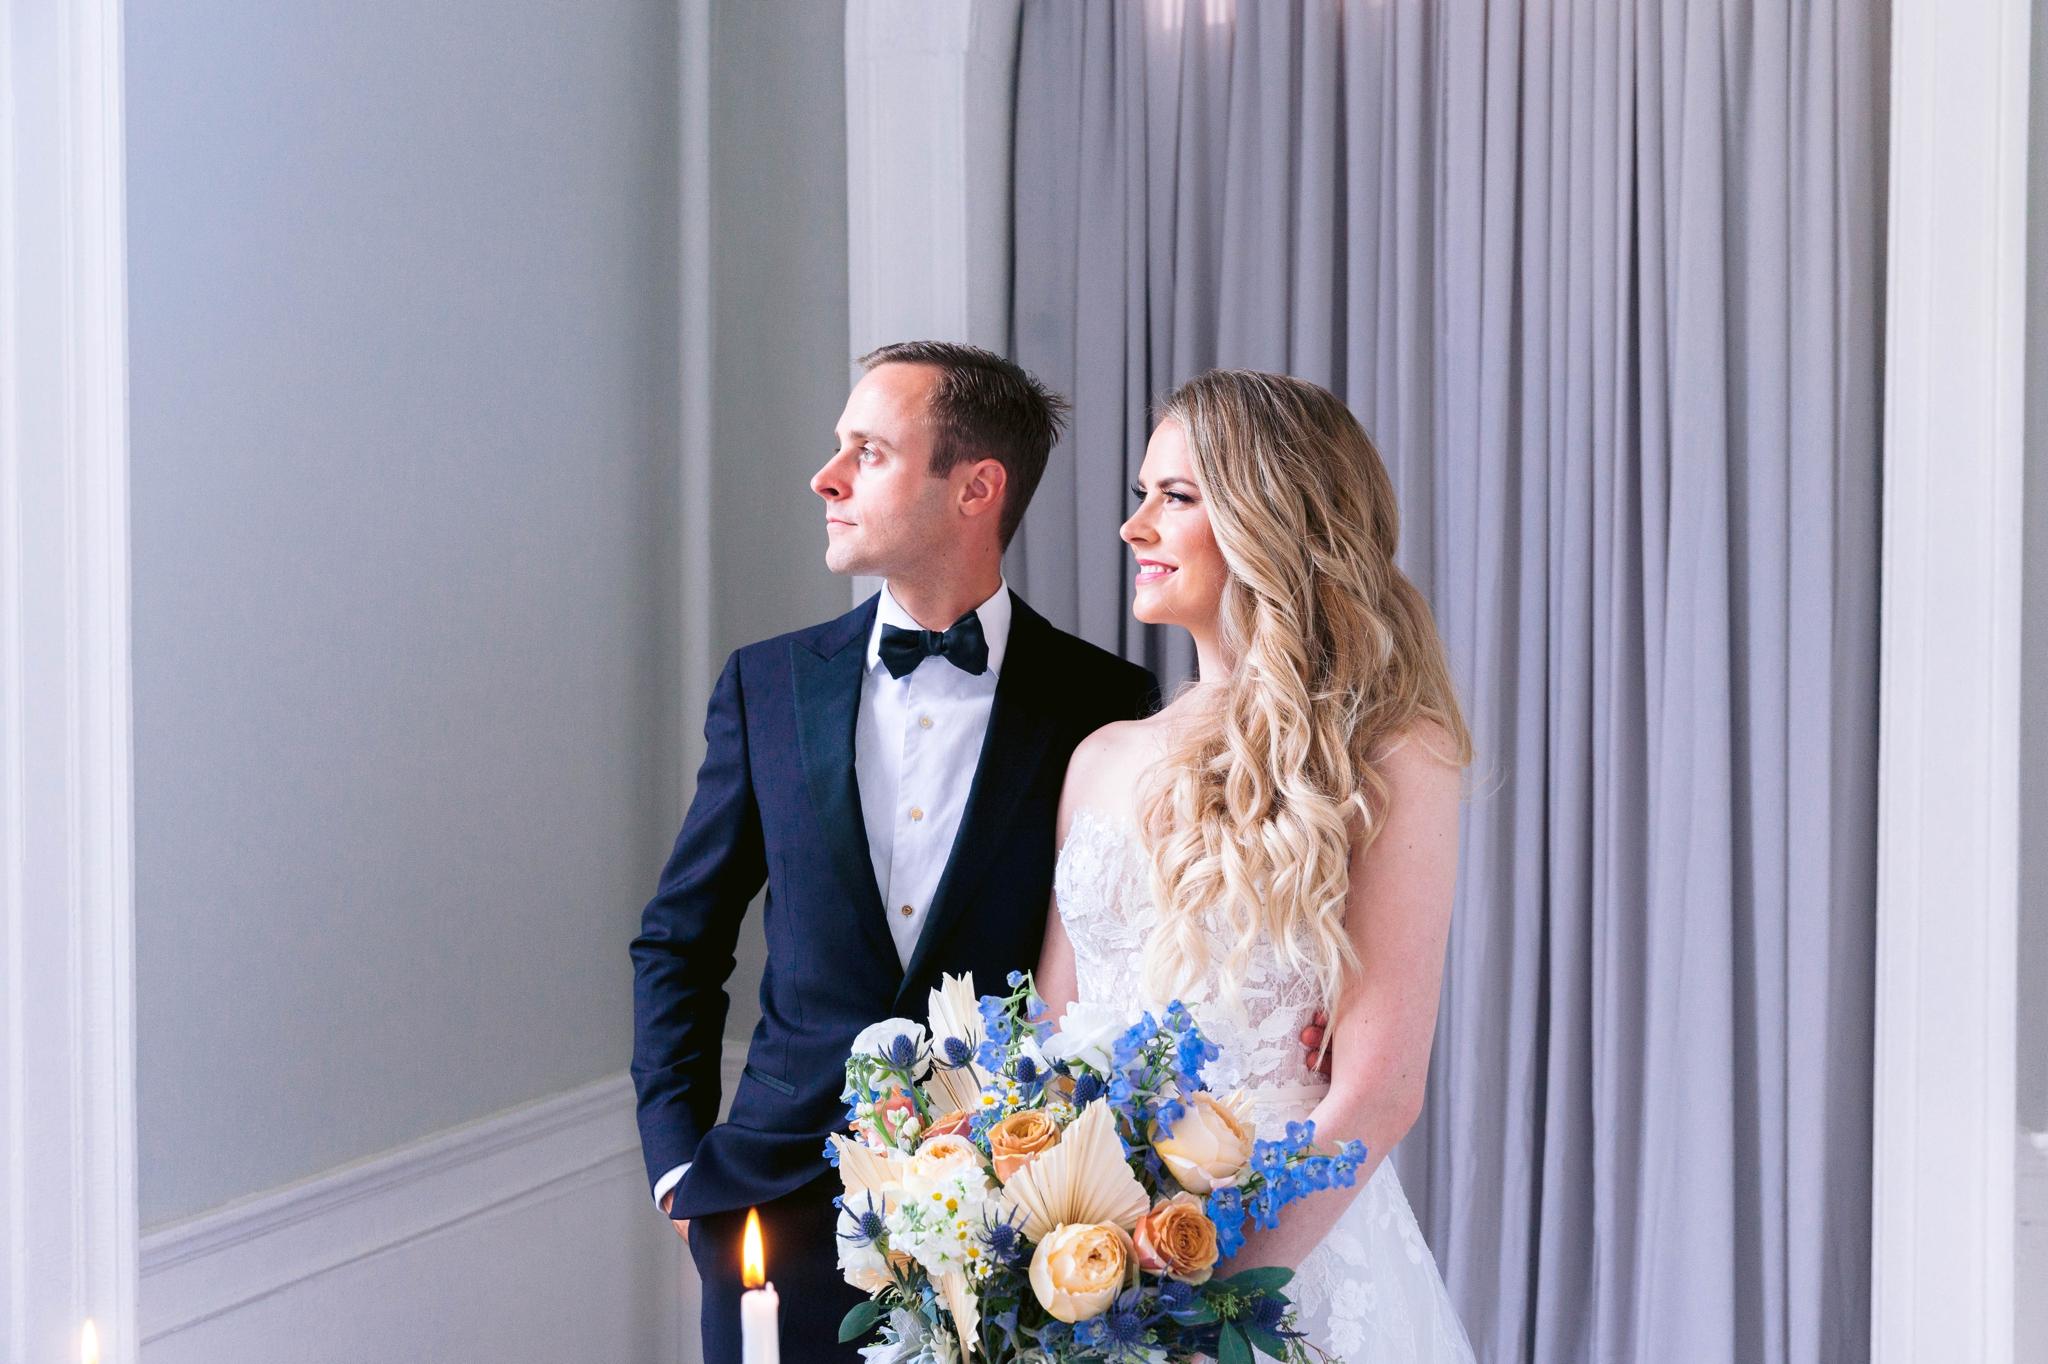 Pastel Blue Wedding Fine Art Wedding Inspiration - Honolulu, Oahu, Hawaii Wedding Photographer - Johanna Dye Photography 21.jpg